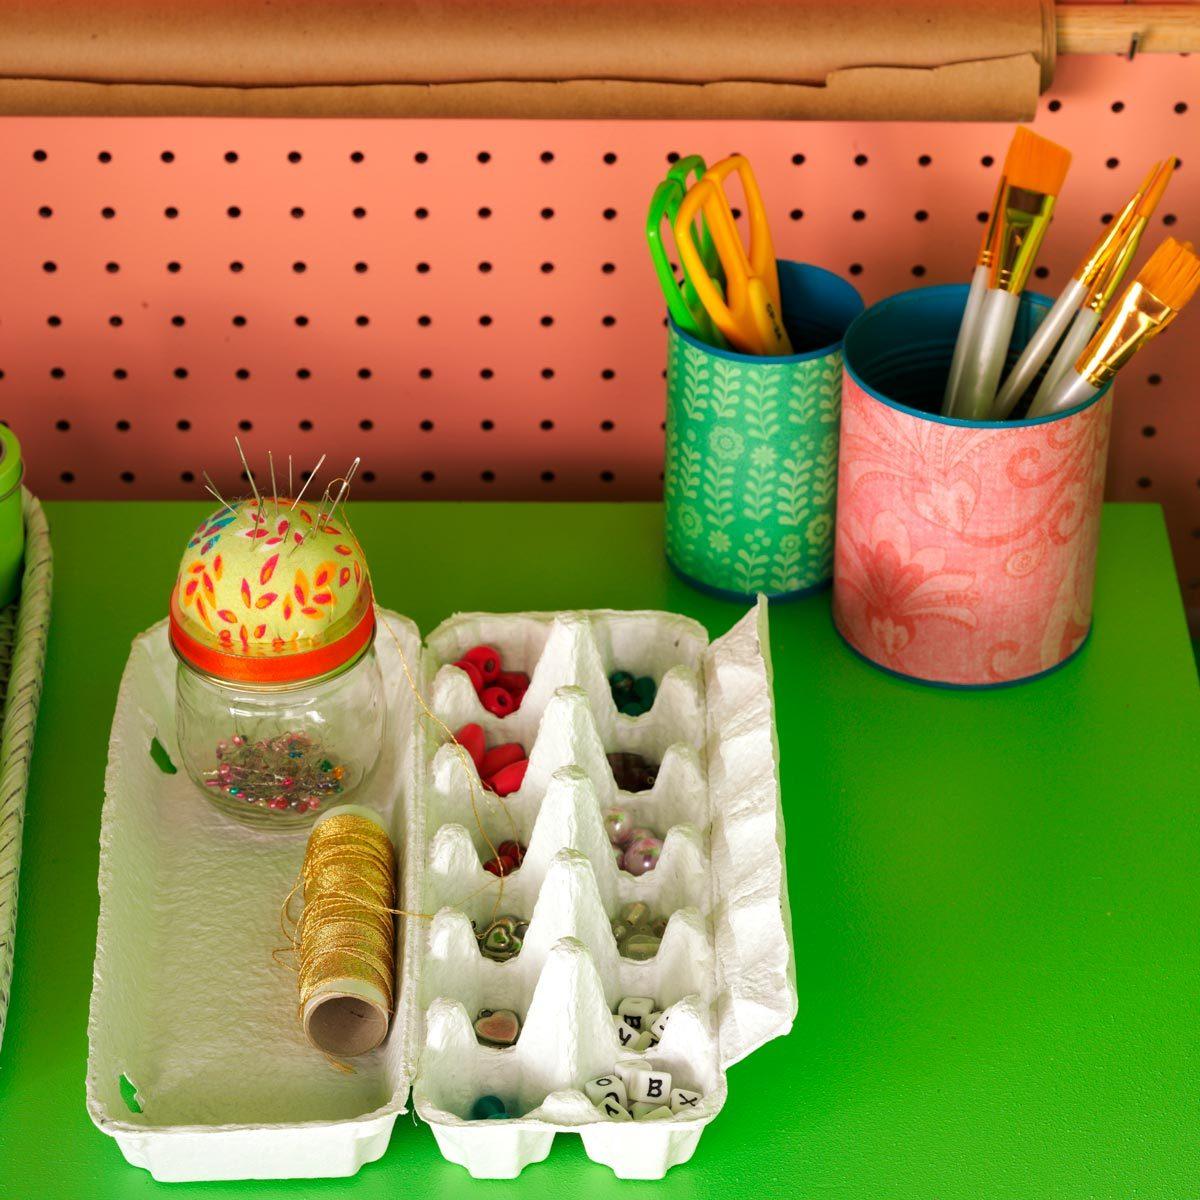 egg carton small objects beads organization